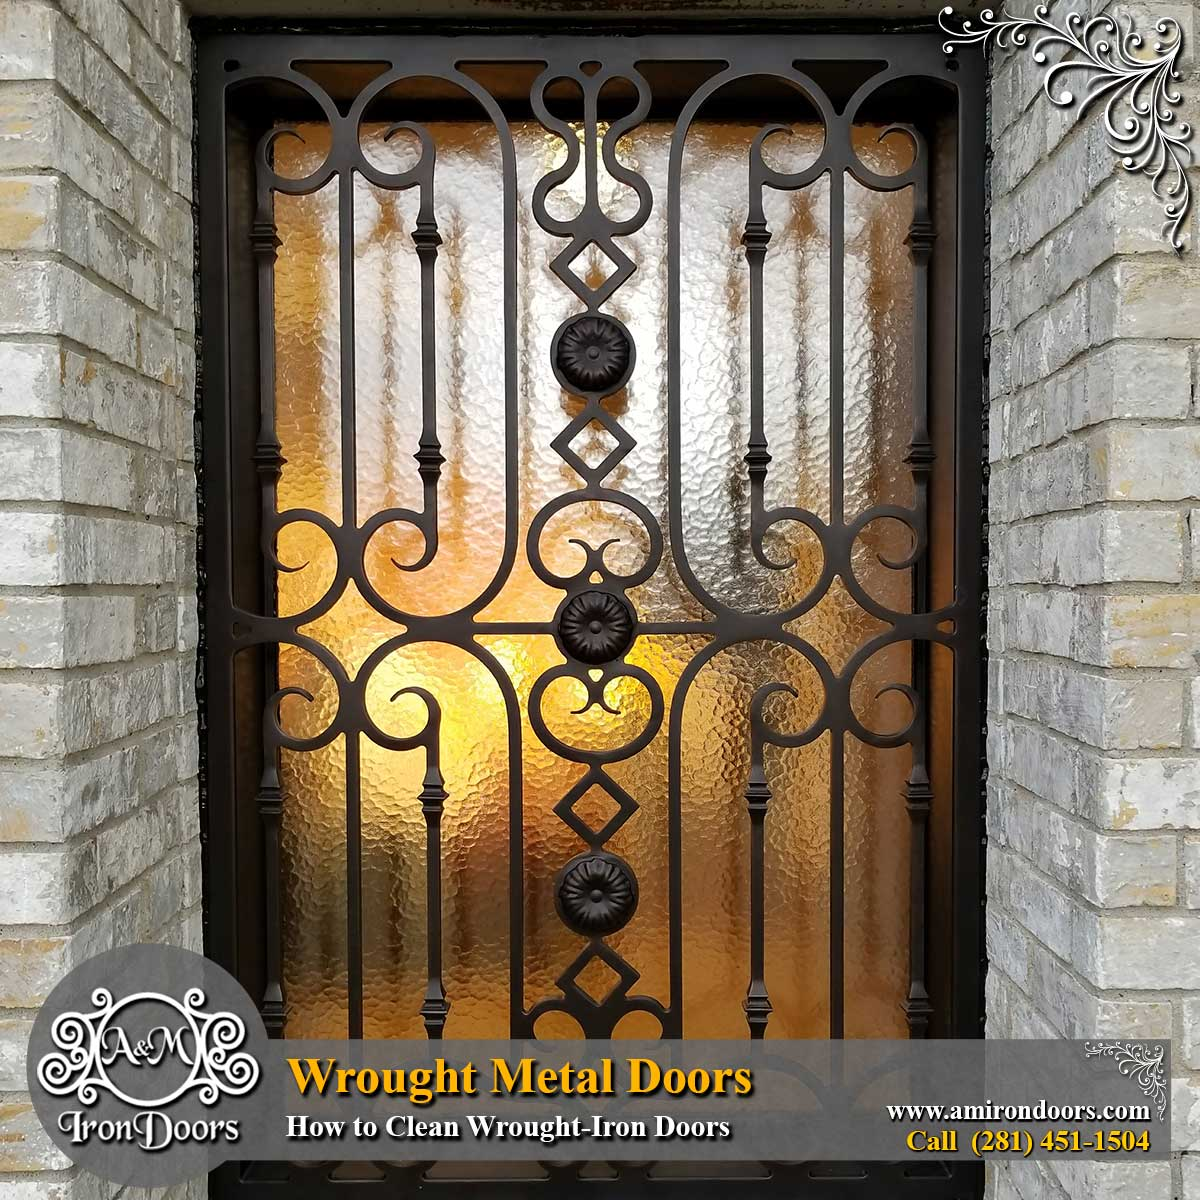 Alberto Marin On Twitter Wrought Metal Doors How To Clean